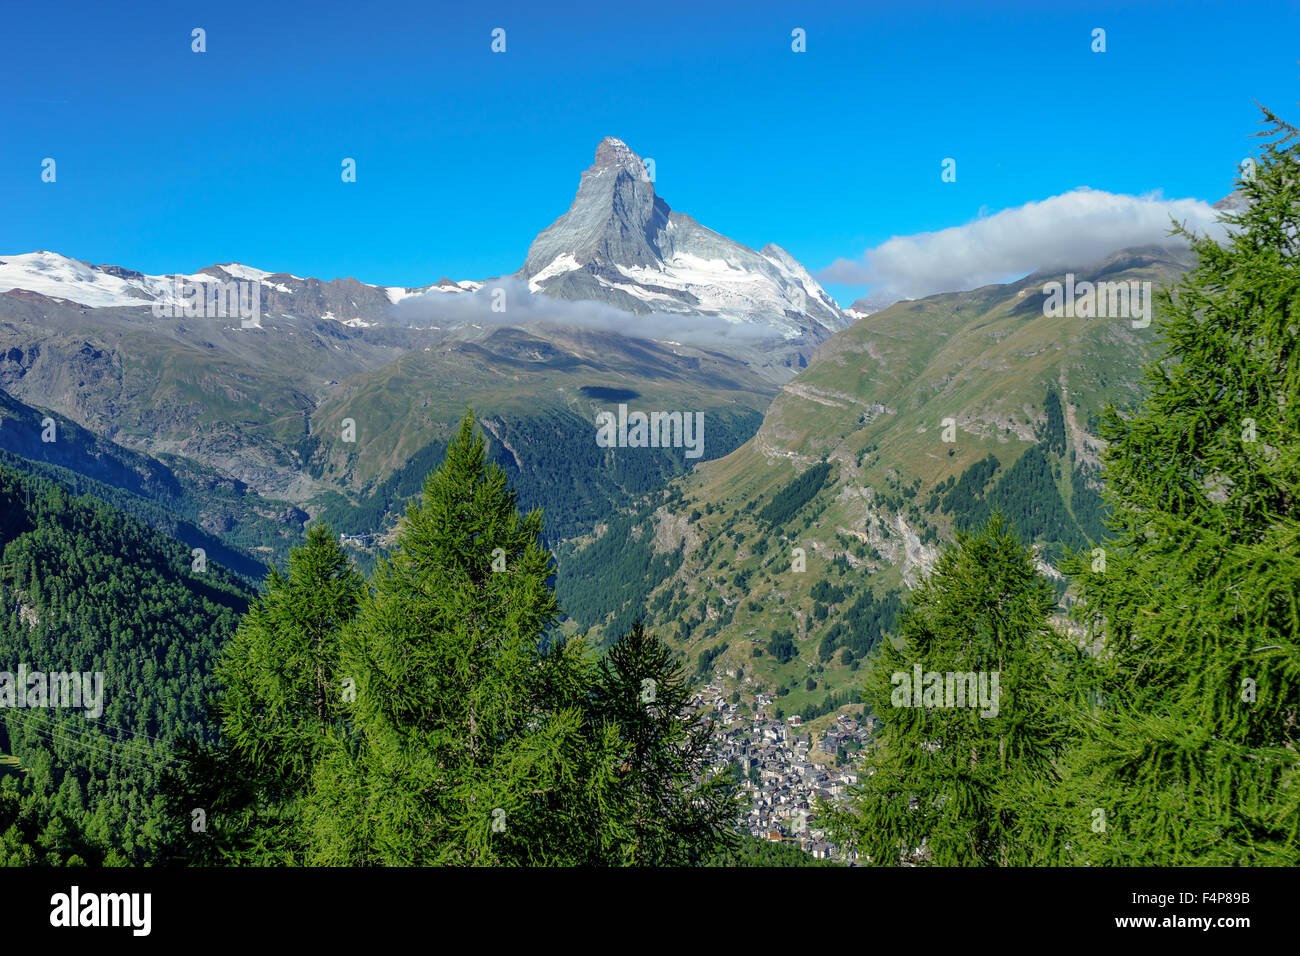 Matterhorn peak, Zermatt, and pine trees. July, 2015. Matterhorn, Switzerland. - Stock Image